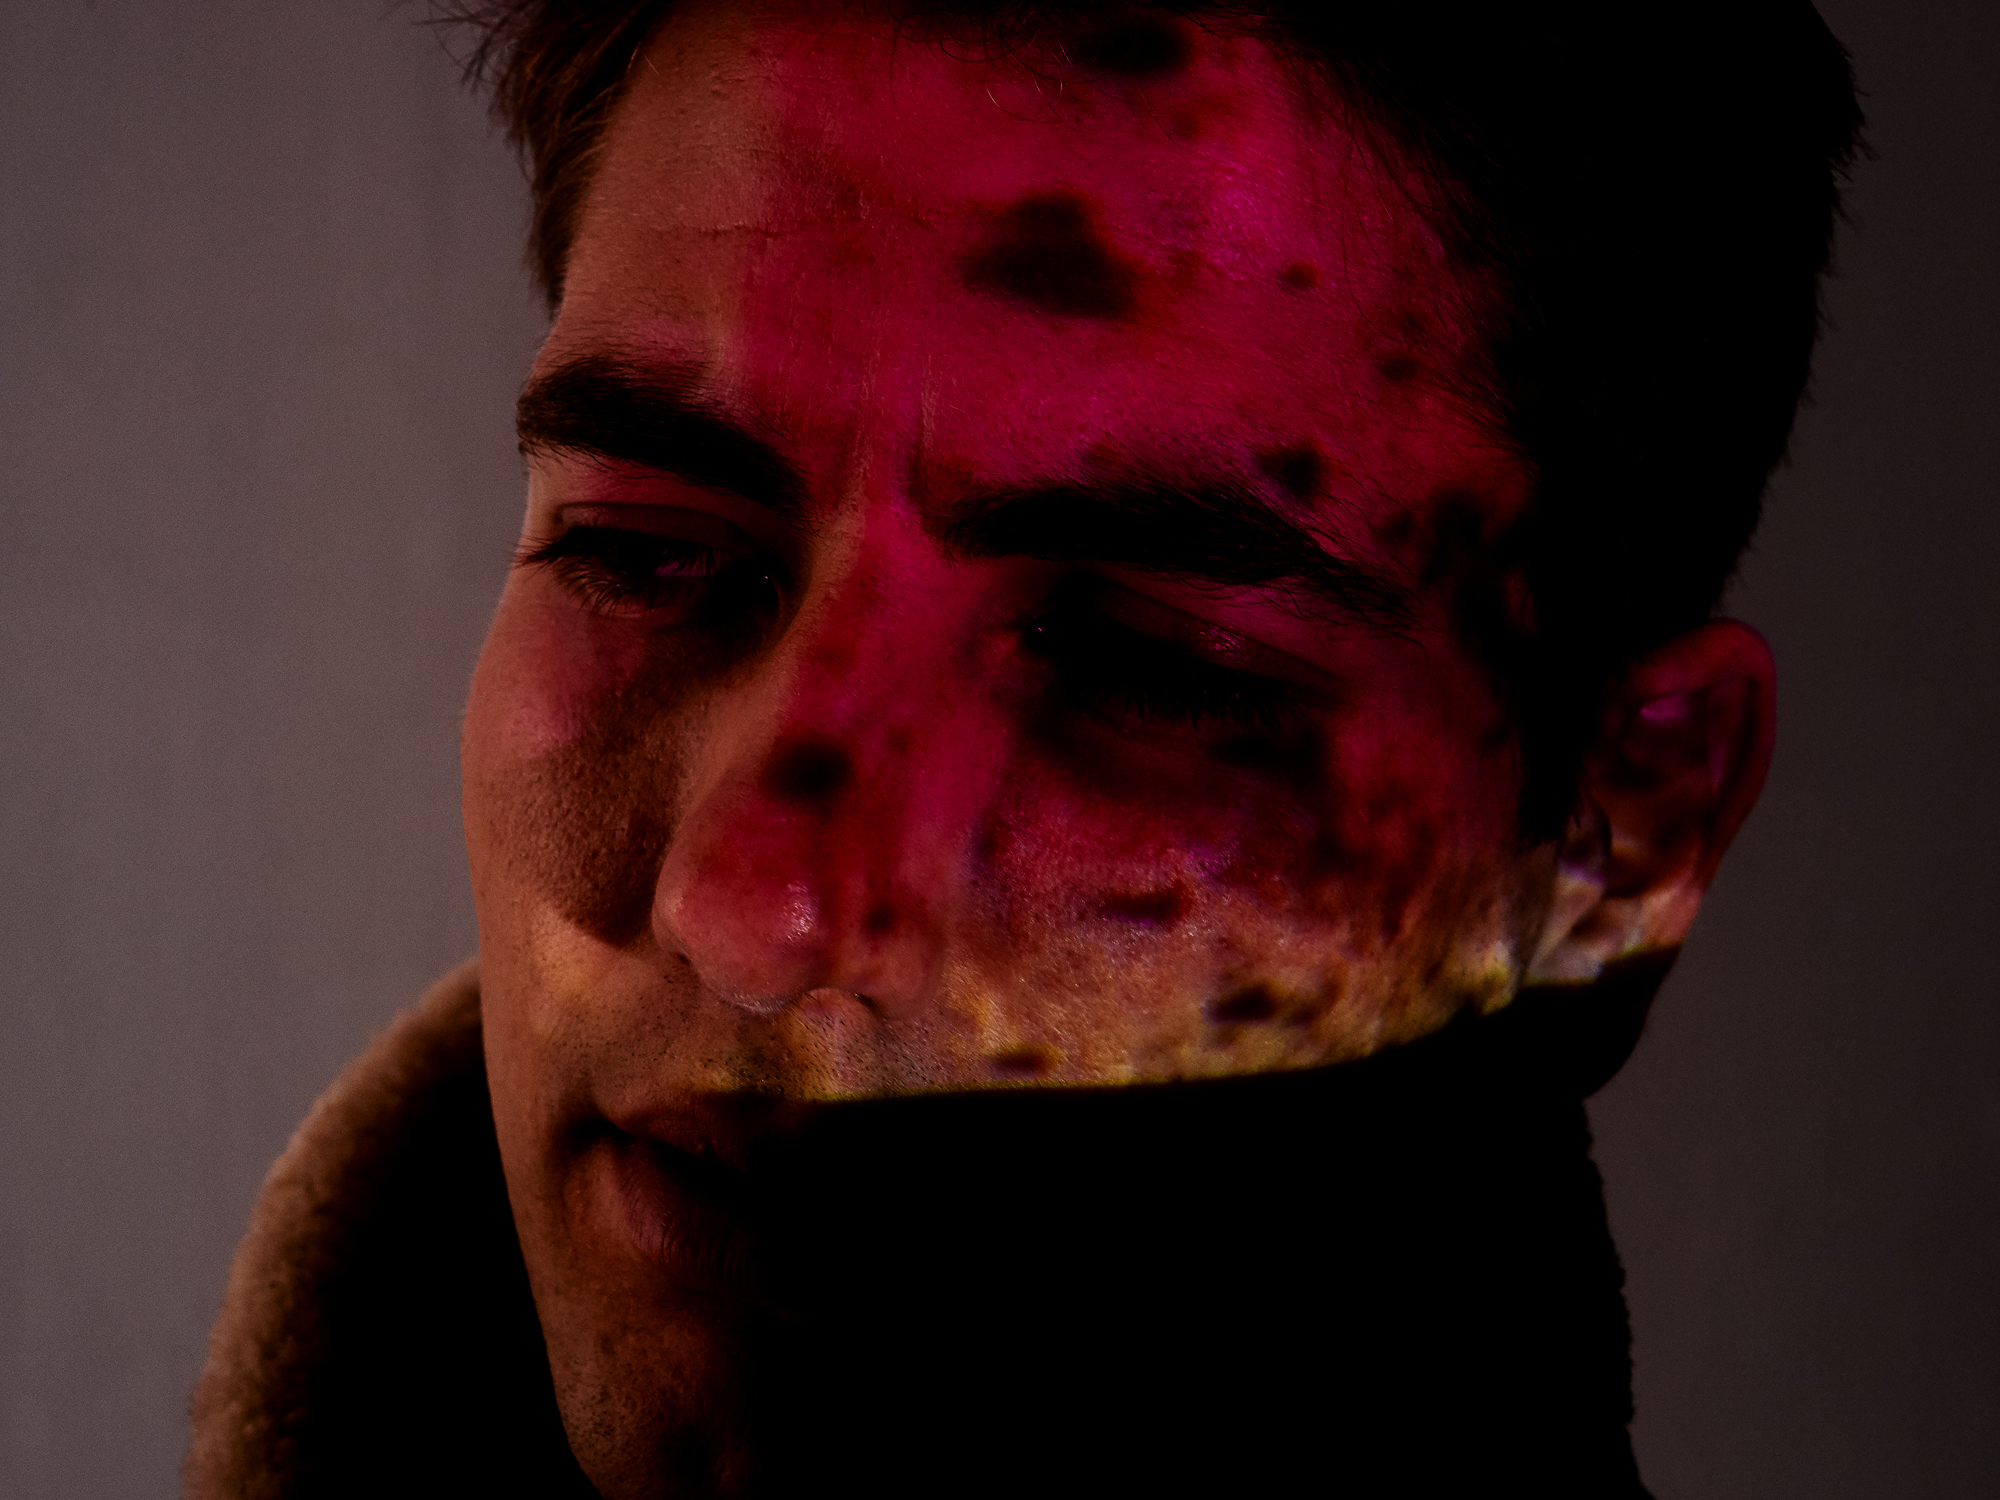 Noel McLaughlin - portrait shot man with flying jacket